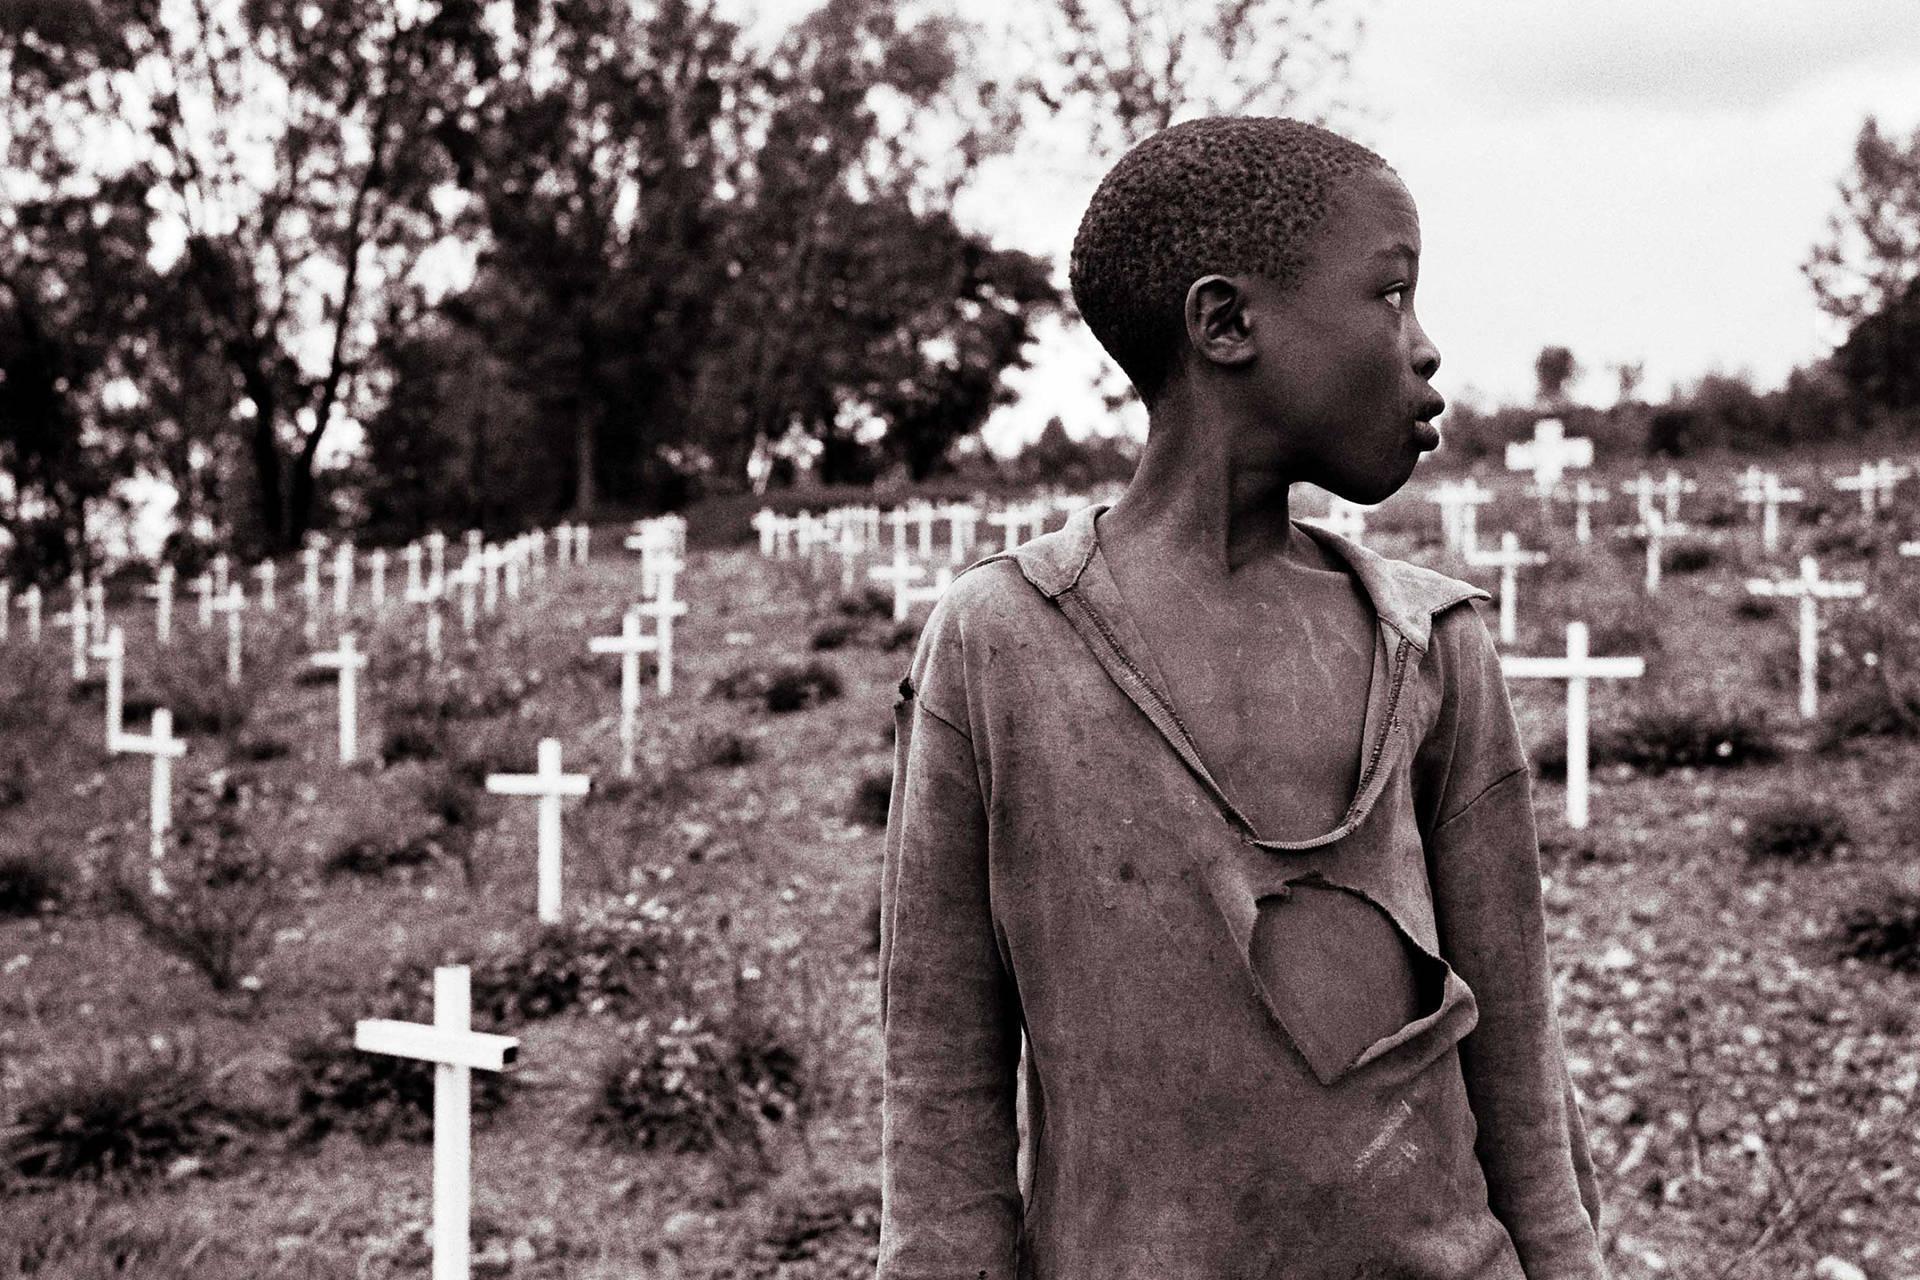 Genocidio-del-Ruanda-foto-54